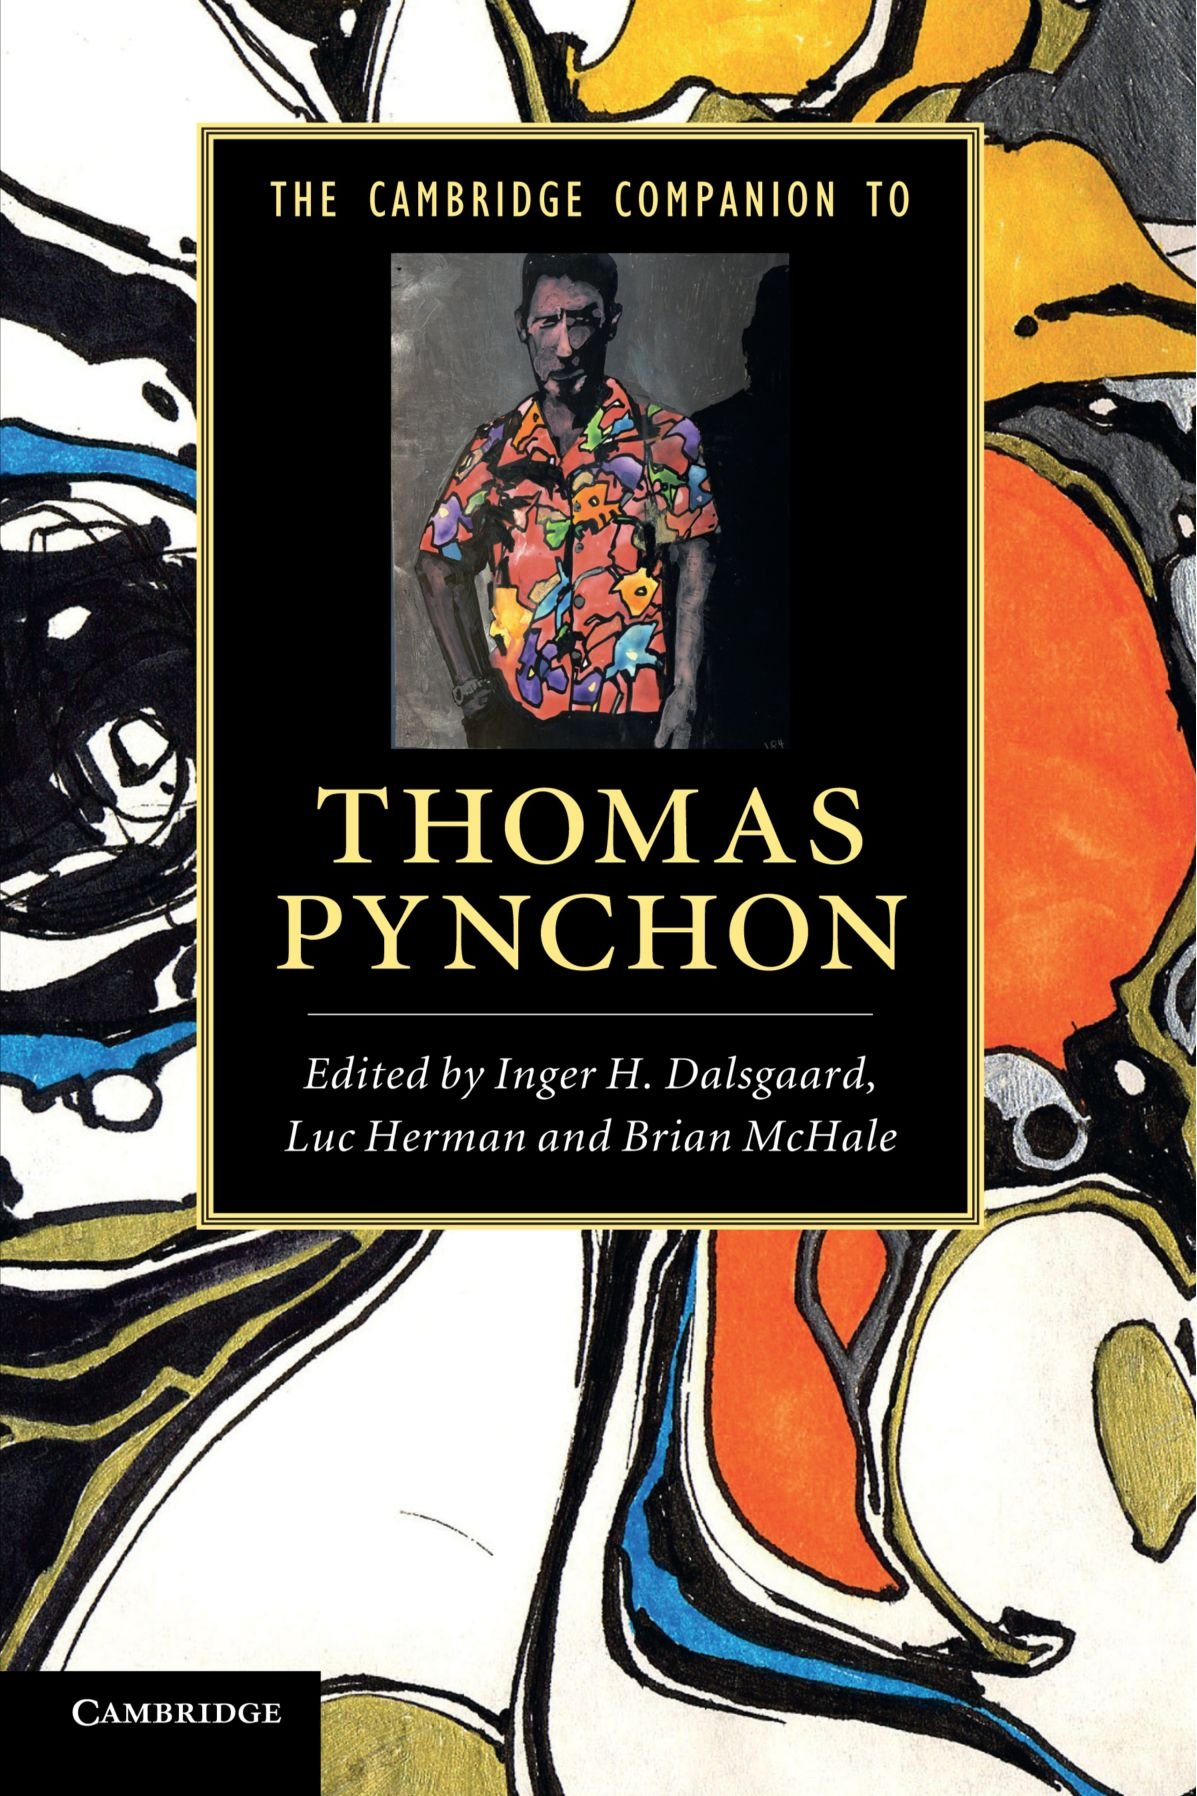 The Cambridge Companion to Thomas Pynchon (Cambridge Companions to Literature) pdf epub